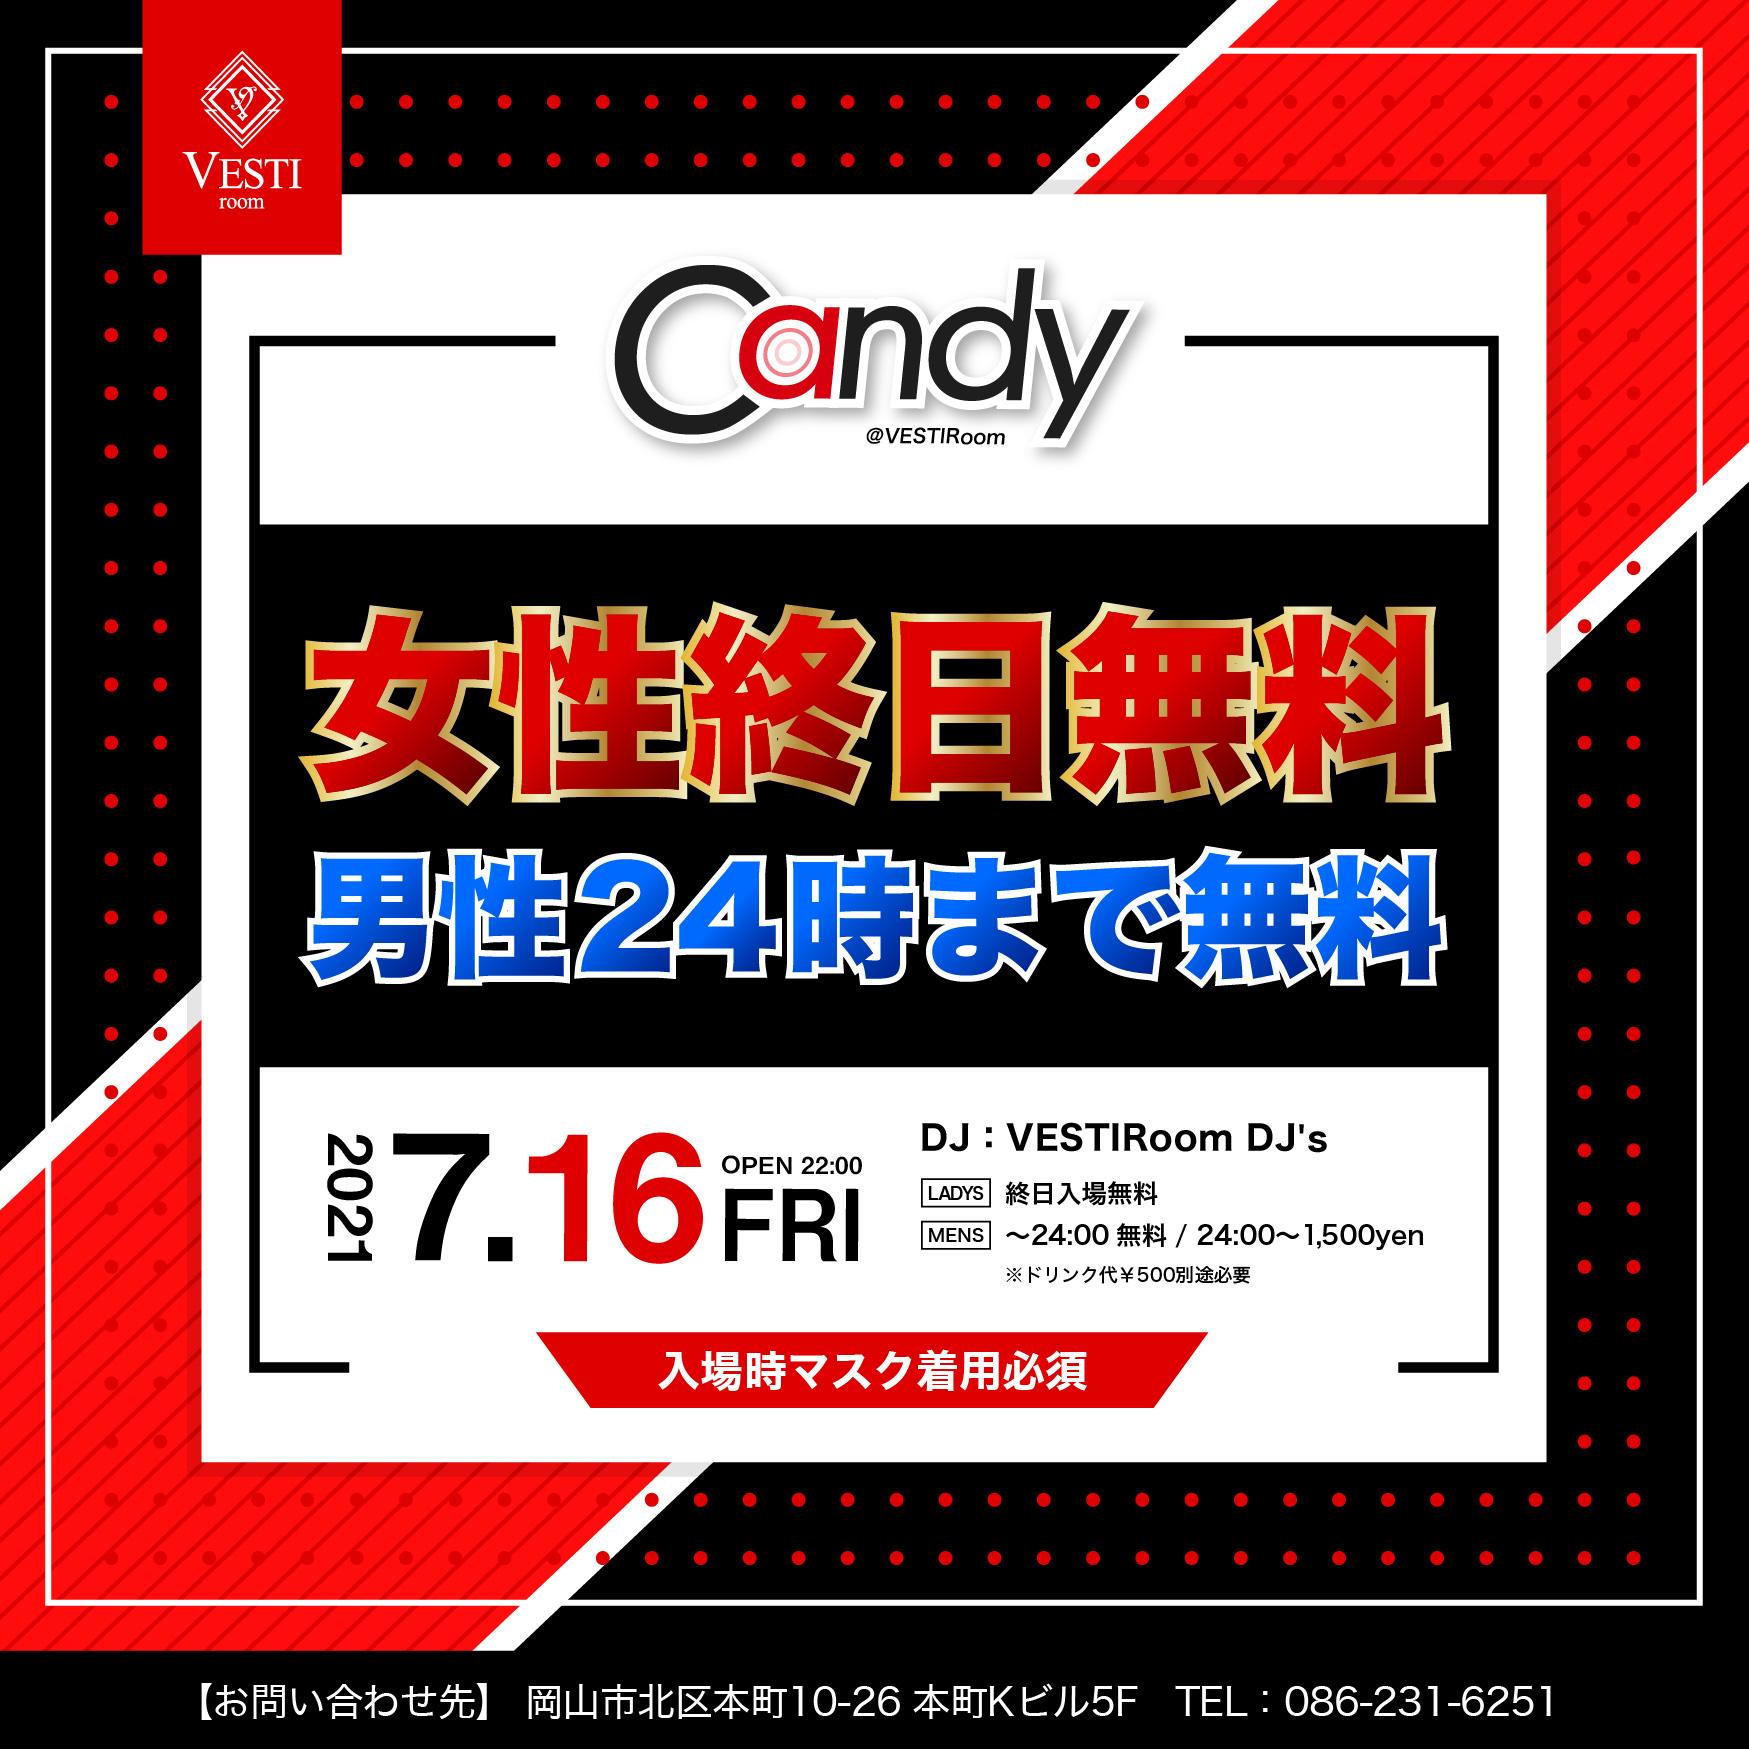 CANDY ~女性終日、男性24時まで入場無料~